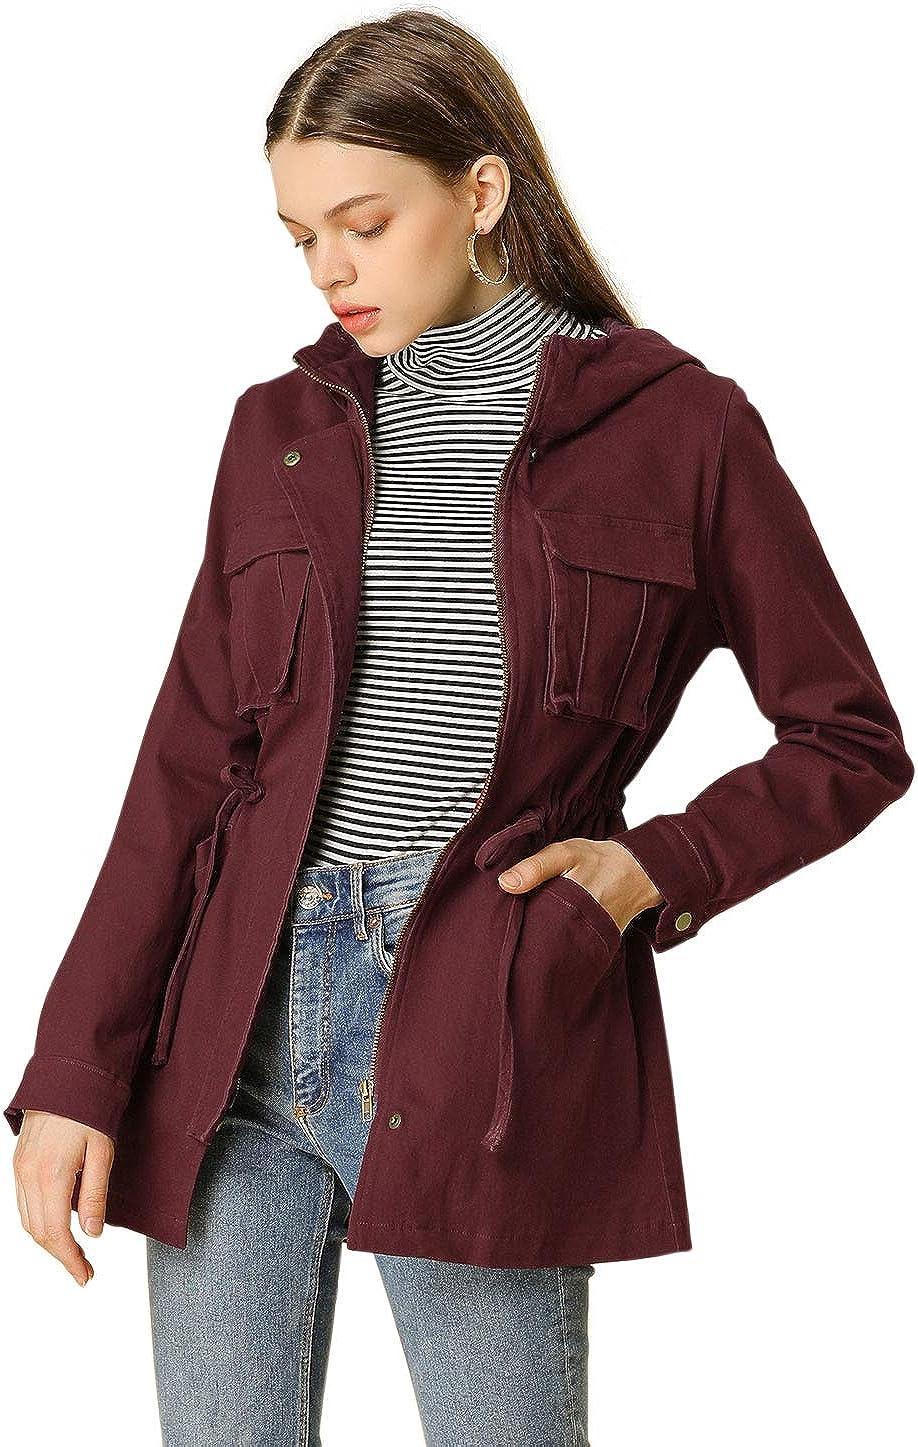 Allegra K Women's Hooded Drawstring Flap Pockets Utility Parka Anorak Jacket